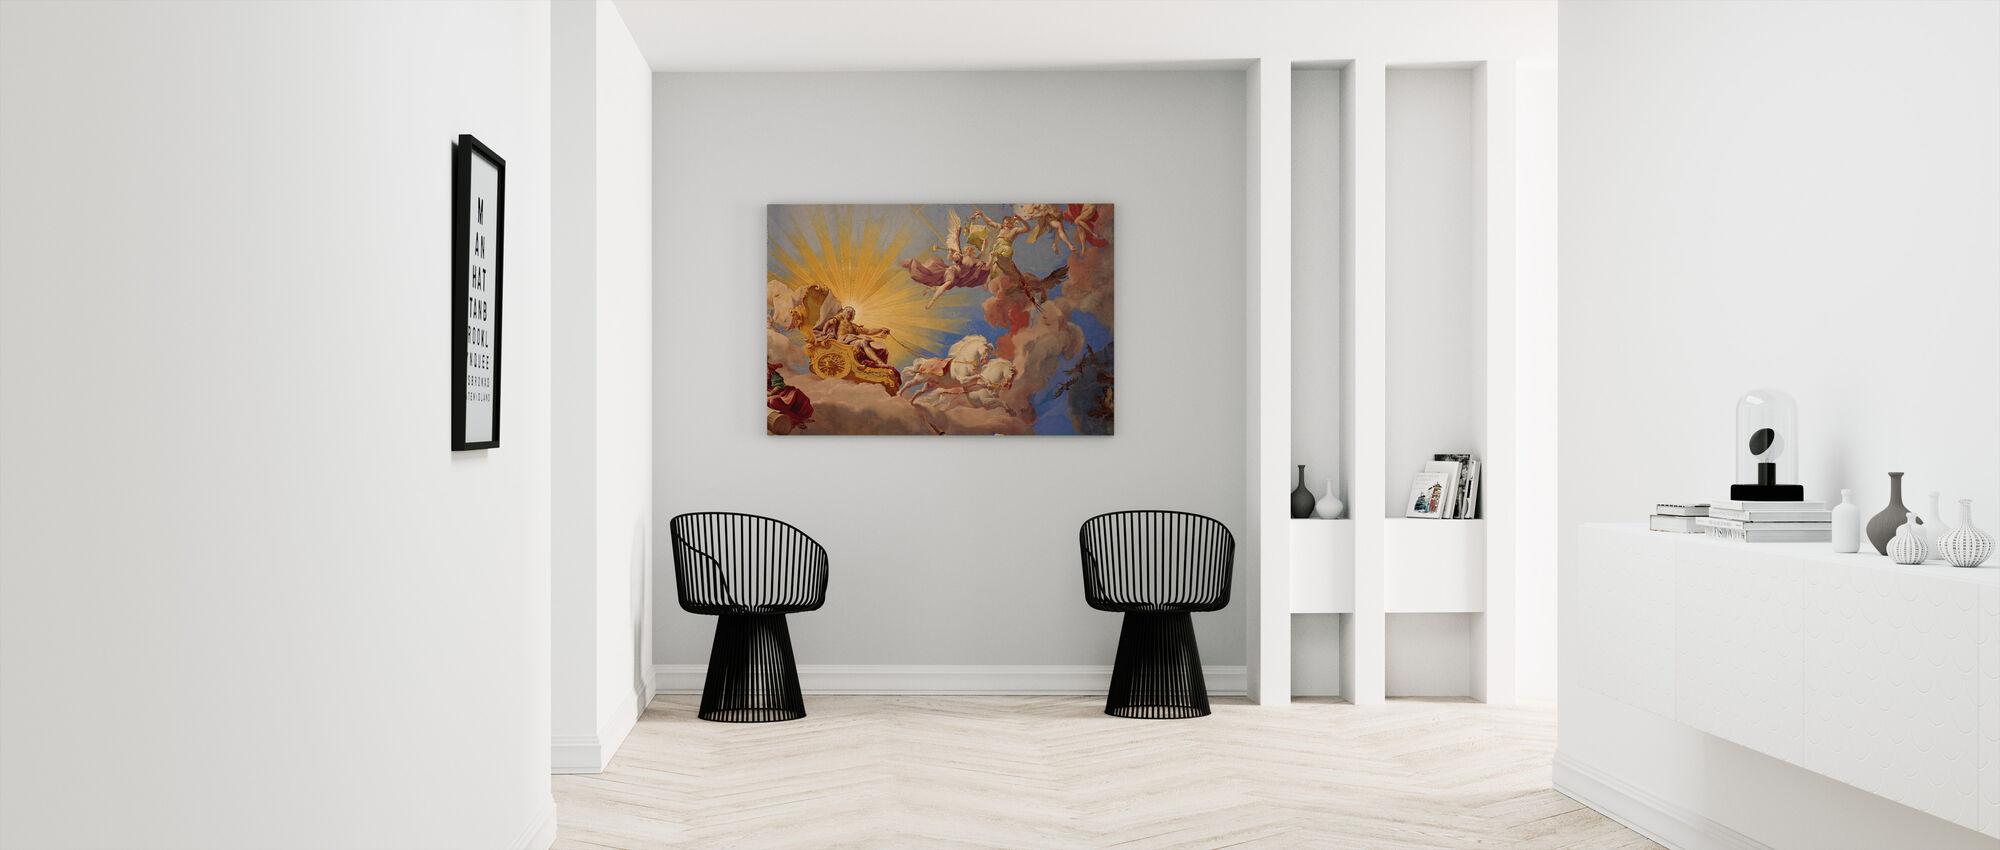 Ceiling Fresco Apotheosis of Emperor Karl VI - Canvas print - Hallway